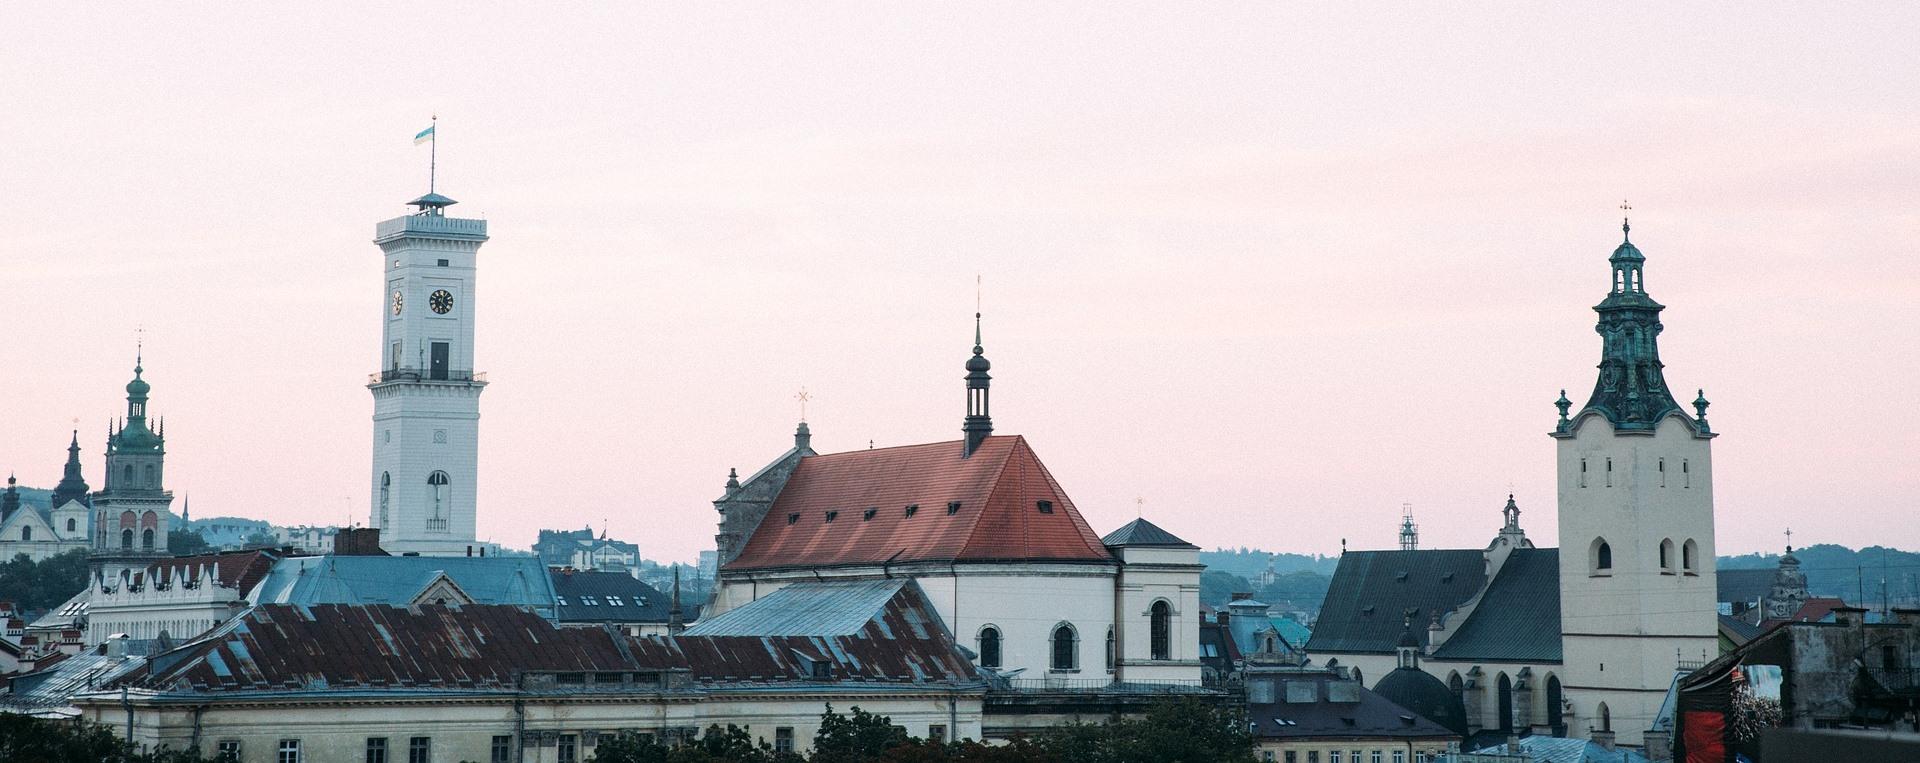 lviv-2705258_1920